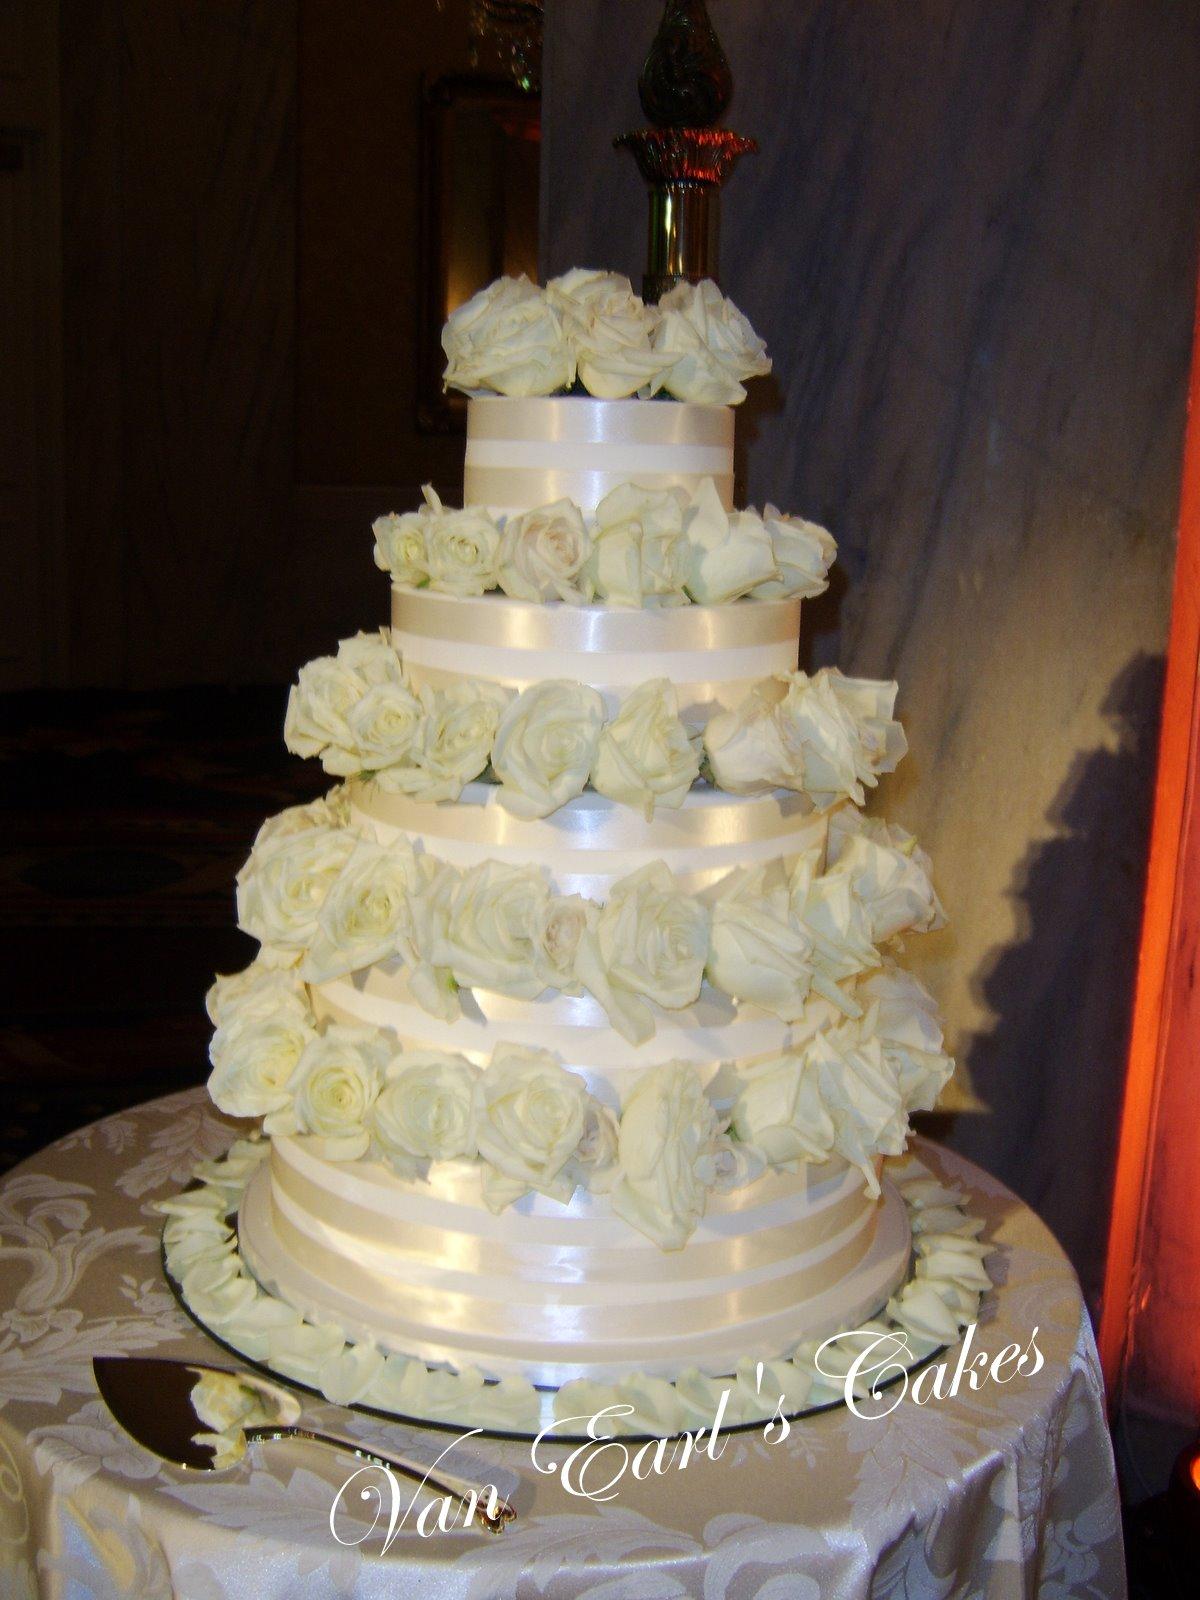 Van Earl s Cakes June 2010